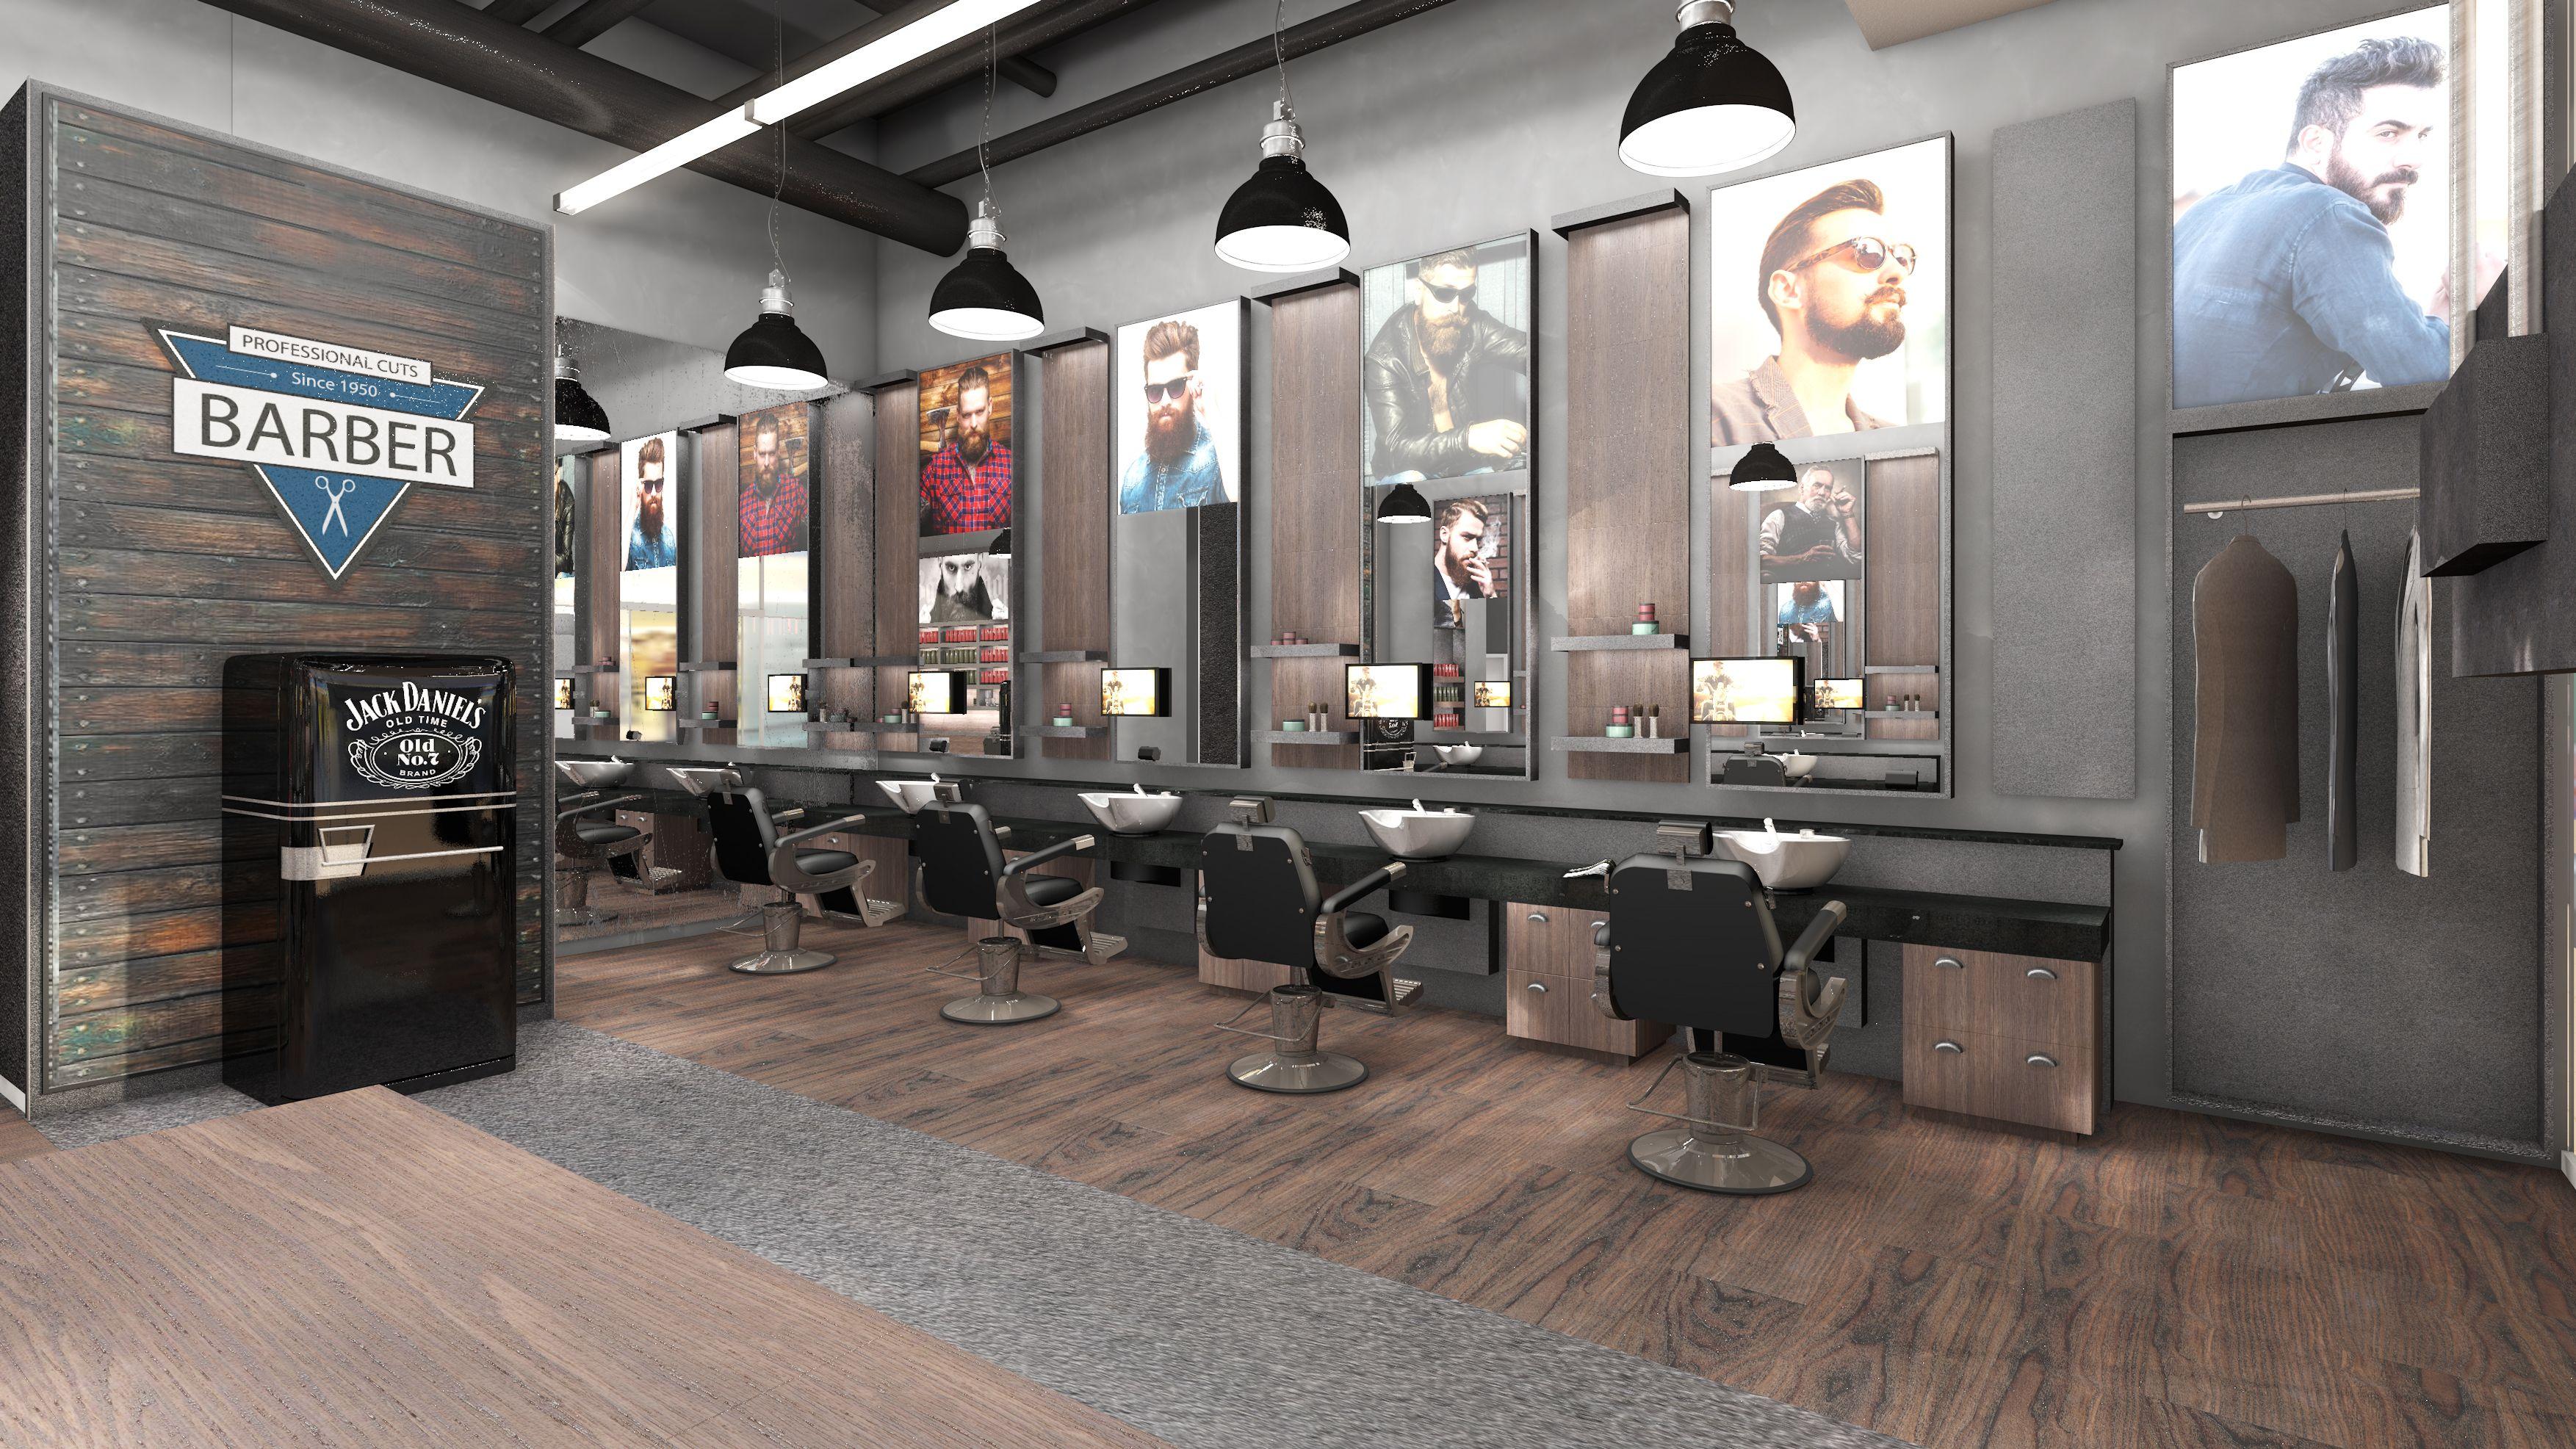 IDEA ONE in 2019 | Salonkonzepte_3D_Animationen_IDEA | Salon design ...